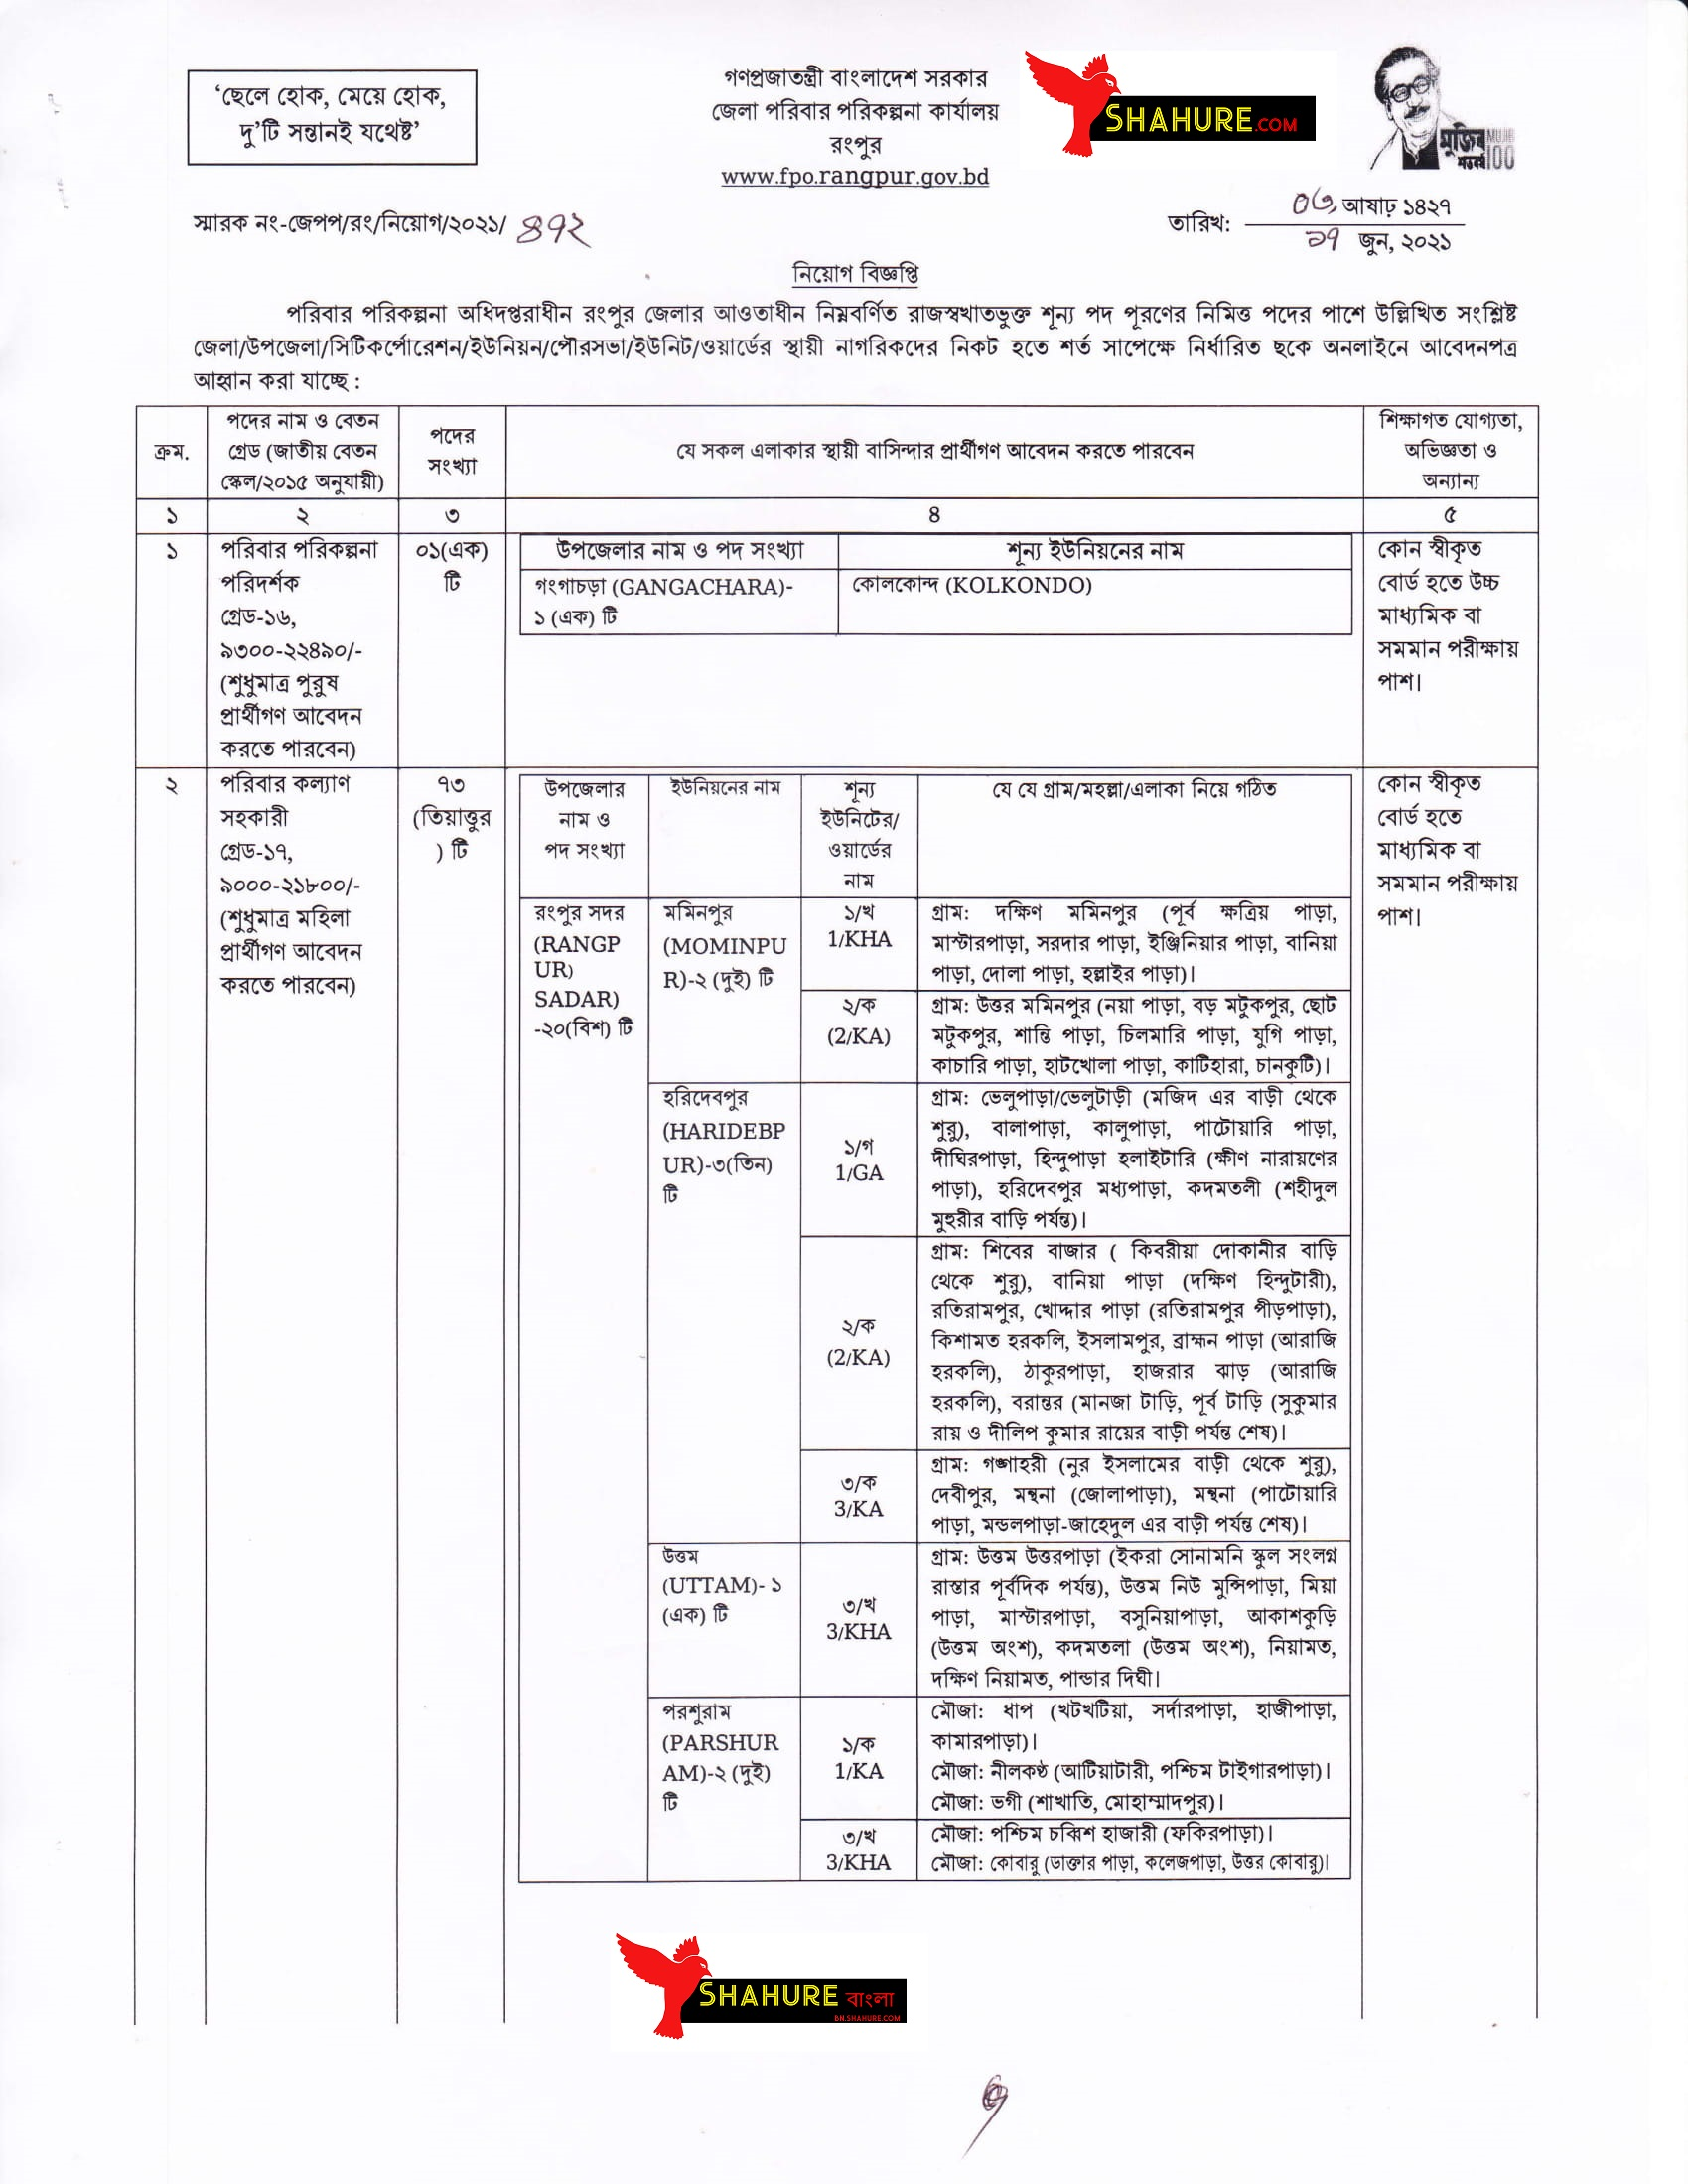 FPO Rangpur Job Circular 2021